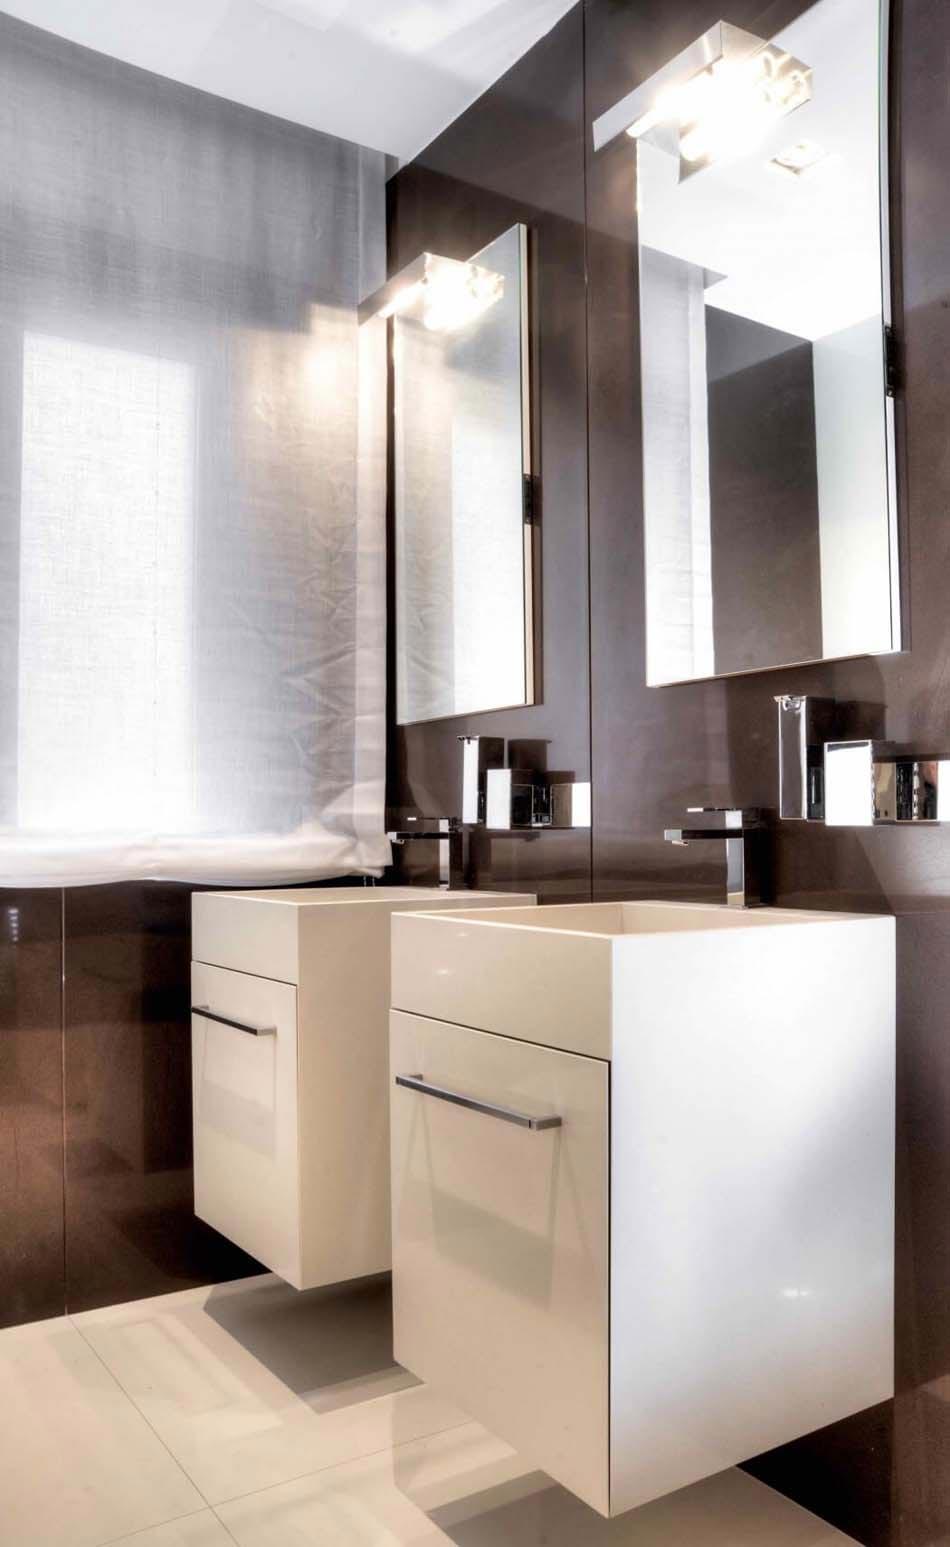 Interieur salle de bain moderne fashion designs for Interieur salle de bain moderne